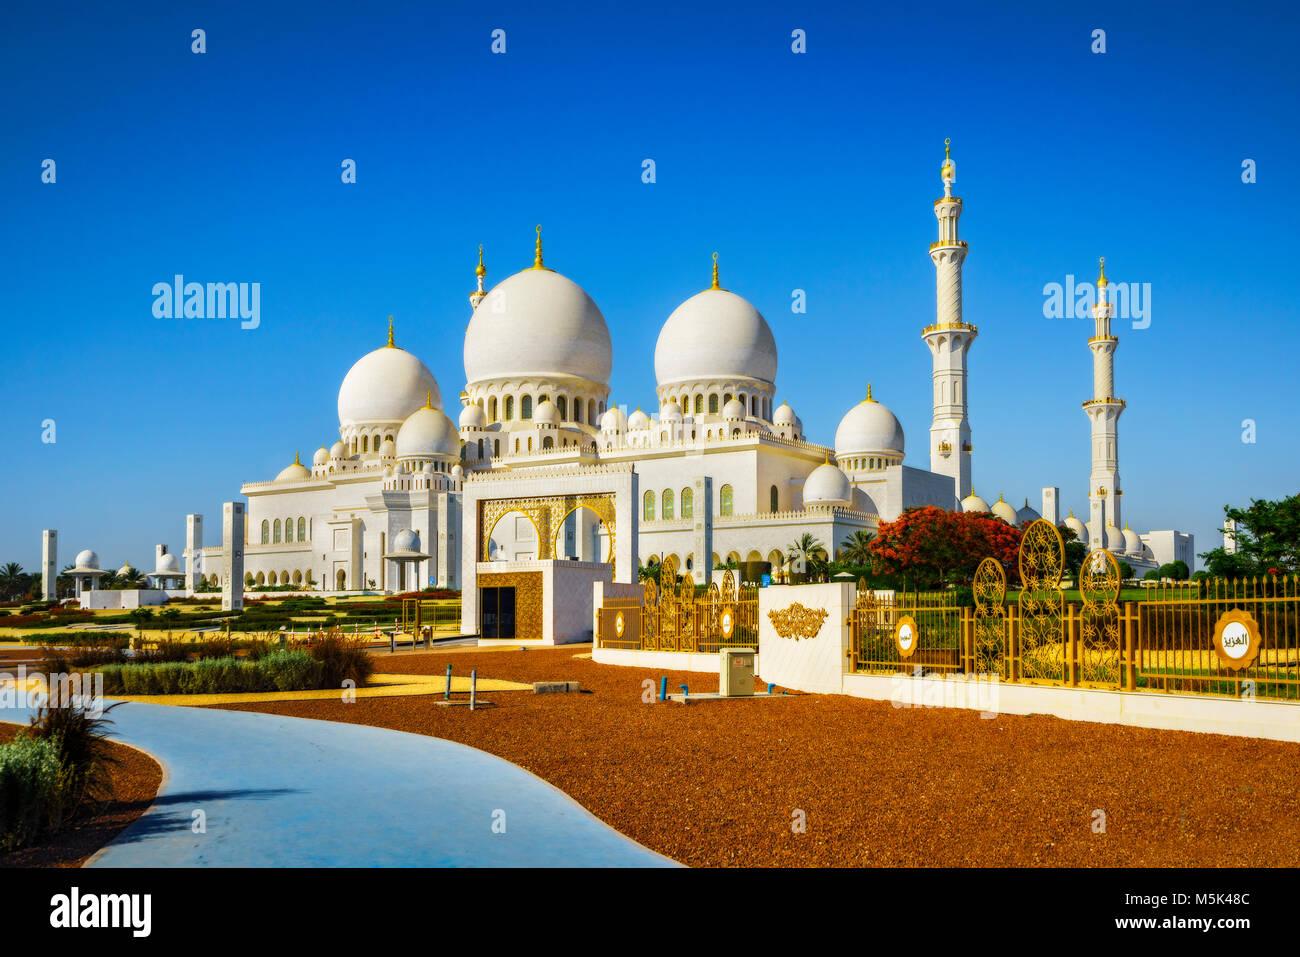 La imponente Gran Mezquita de Sheikh Zayed en Abu Dhabi Imagen De Stock